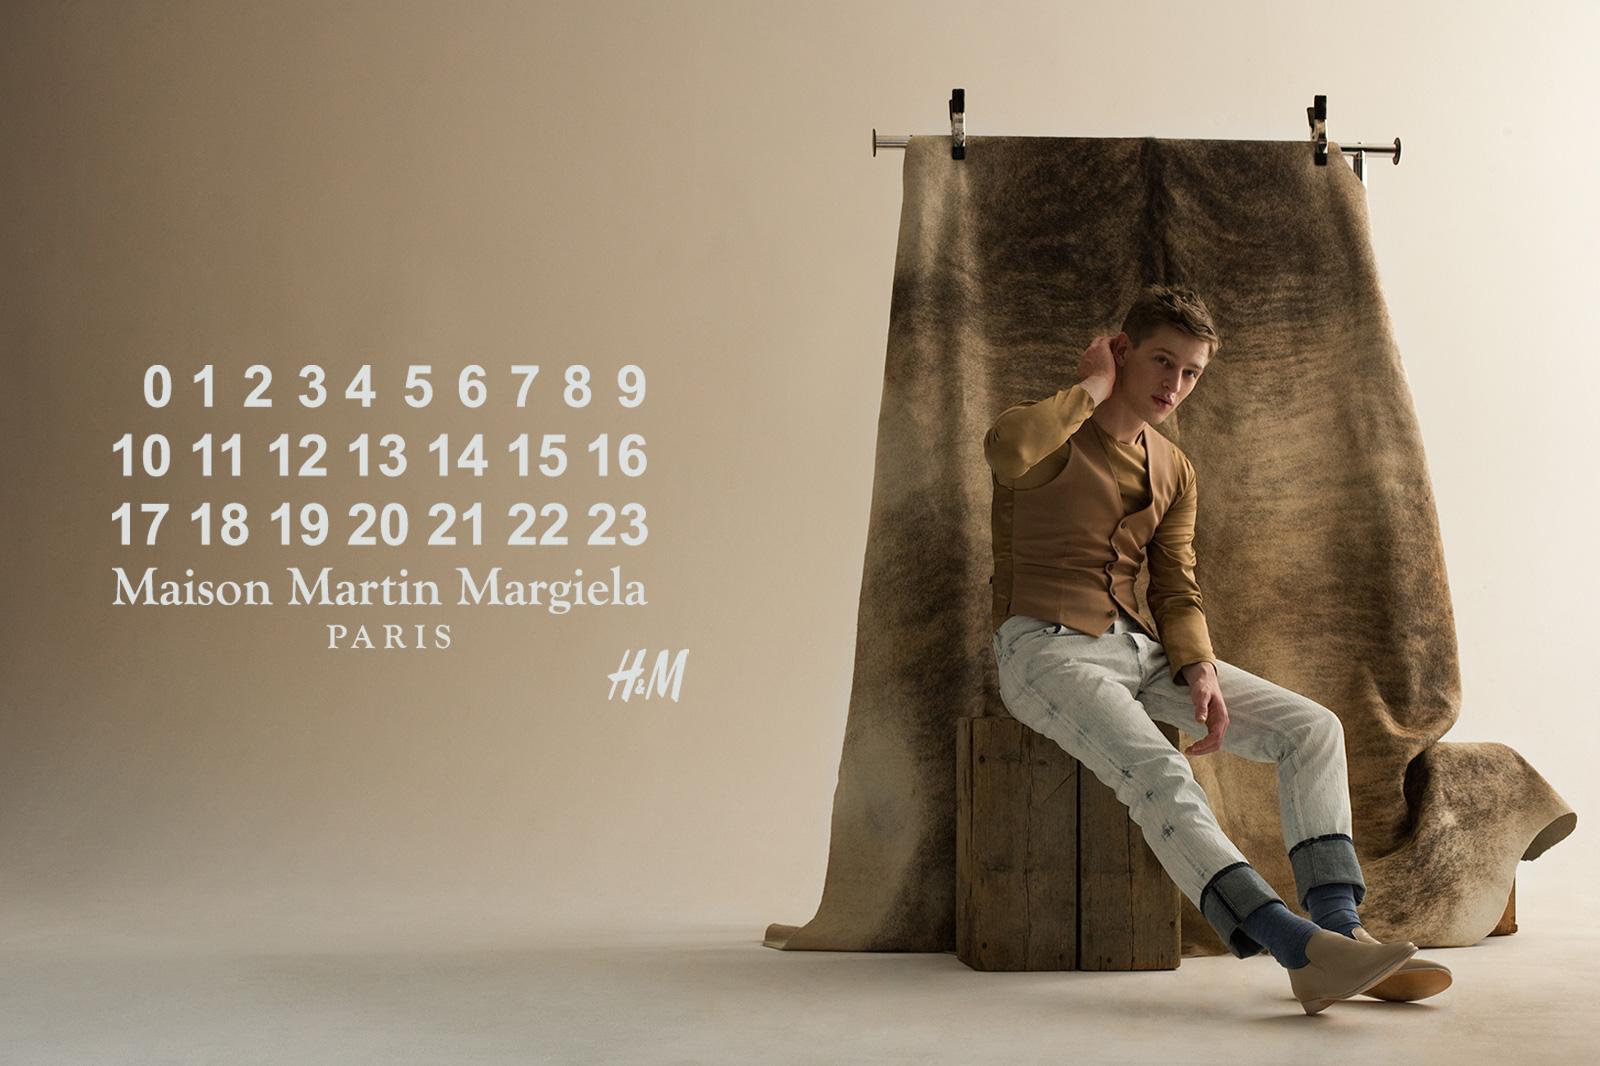 adam-merks-hm-maison-martin-margiela-2012-highsnobiety-01